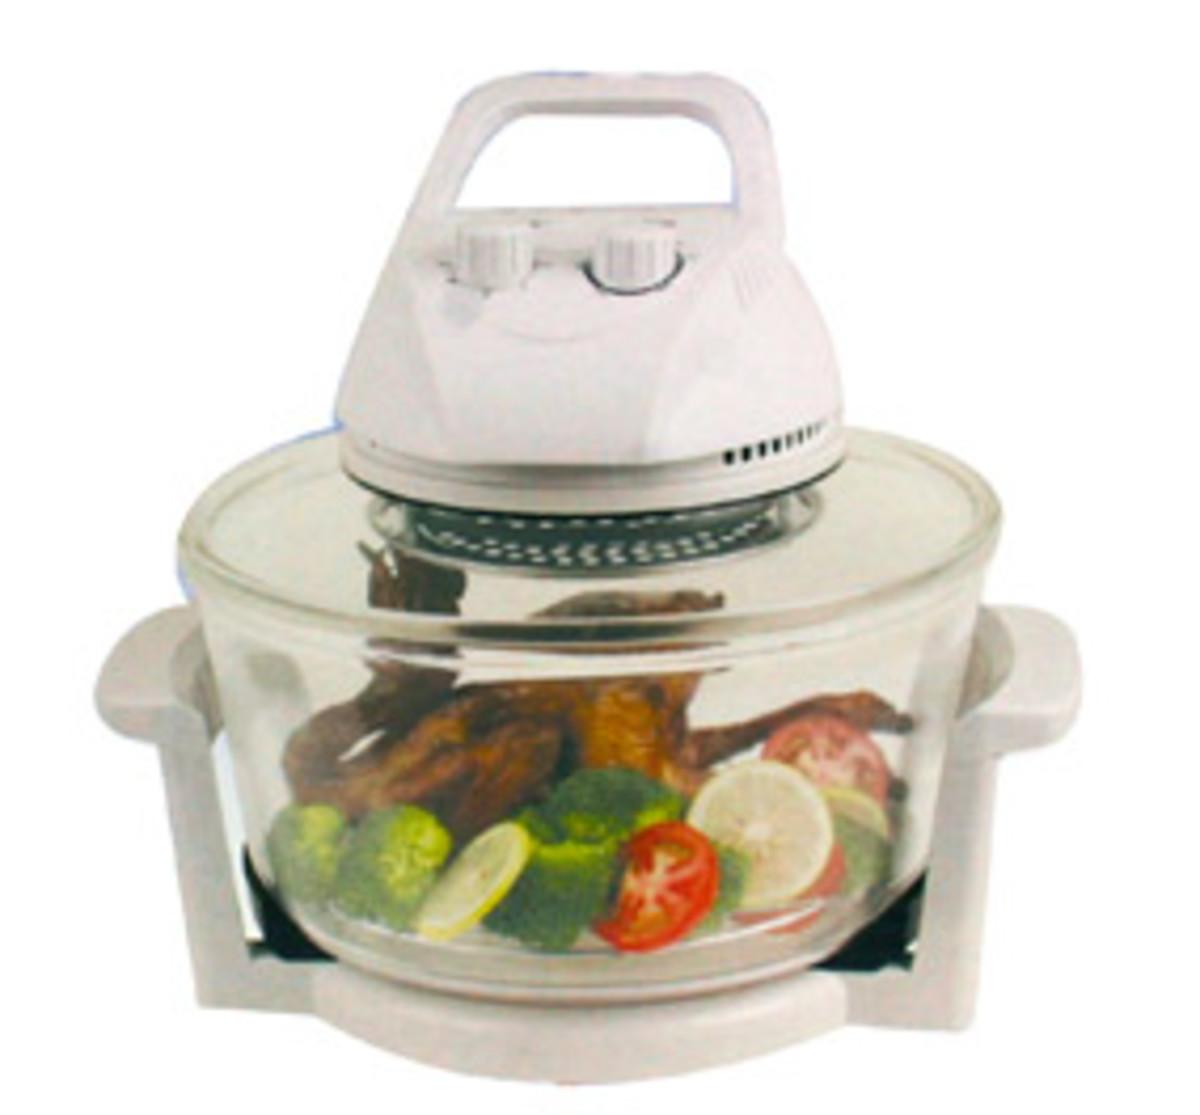 turbo cooker